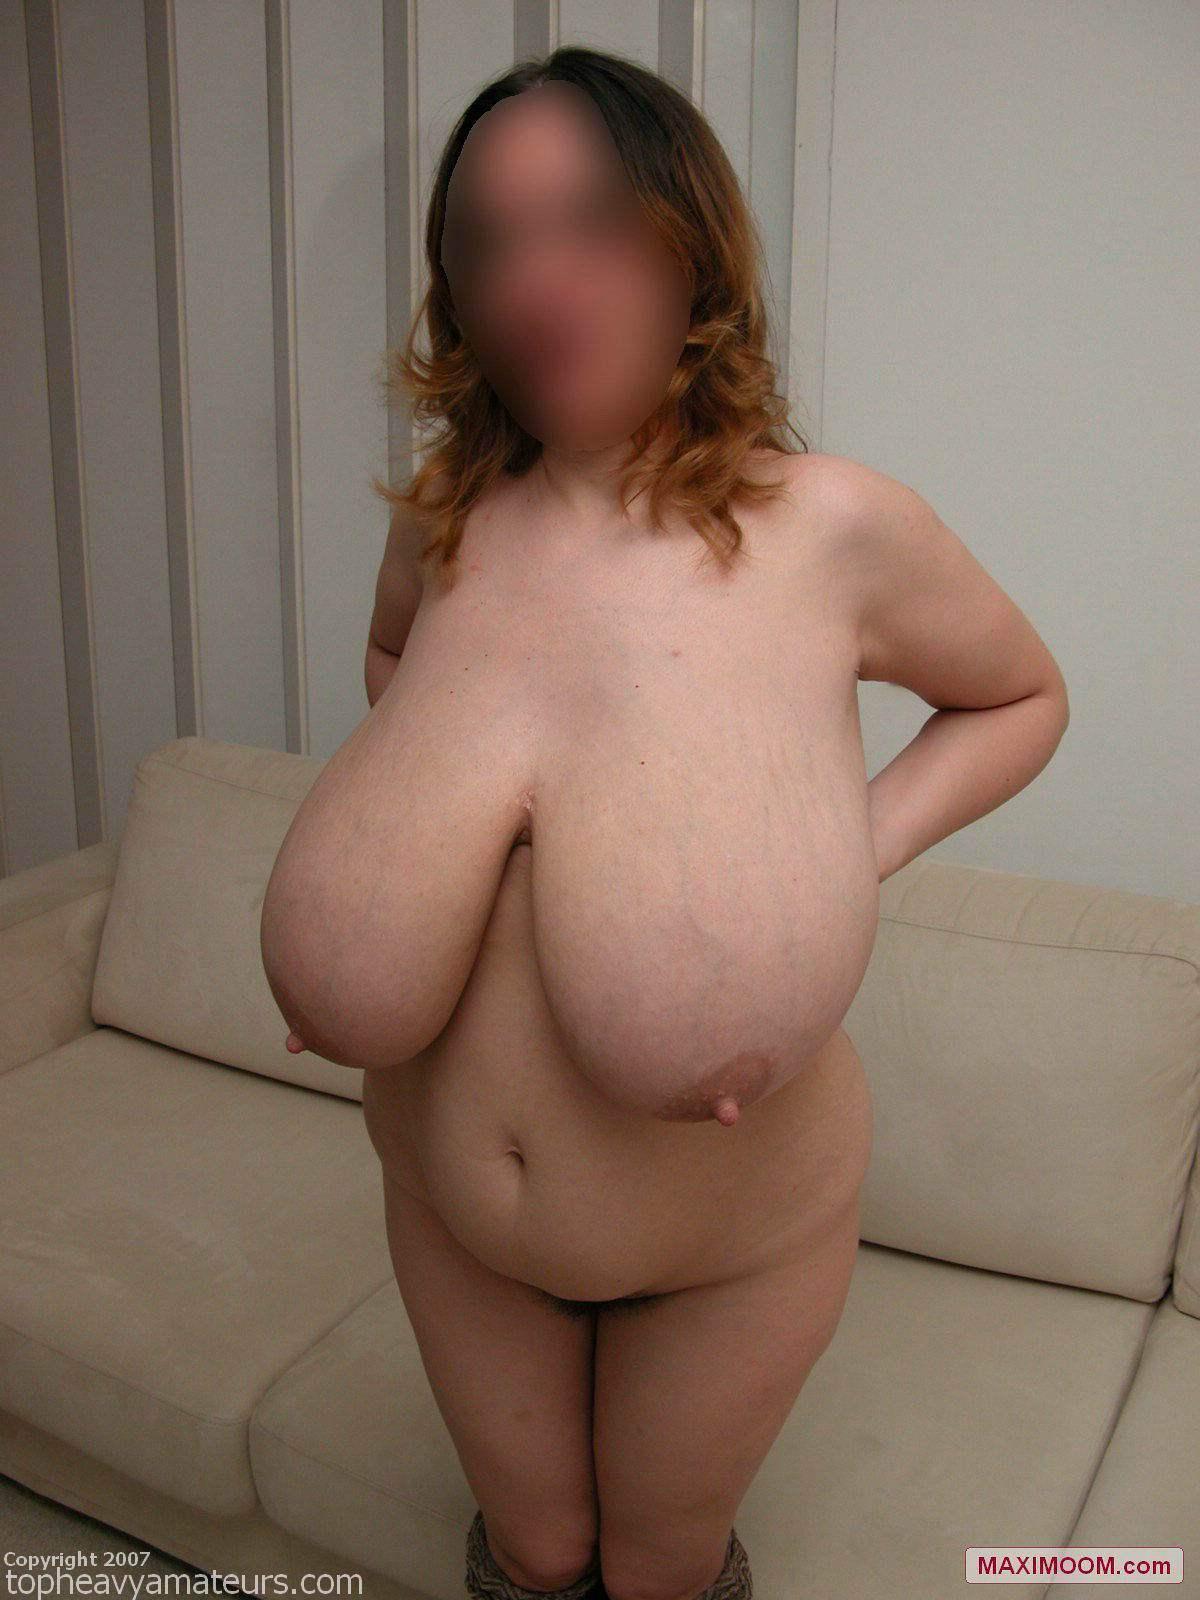 Chubby Big Hanging Tits Chubby Wife Big Tits